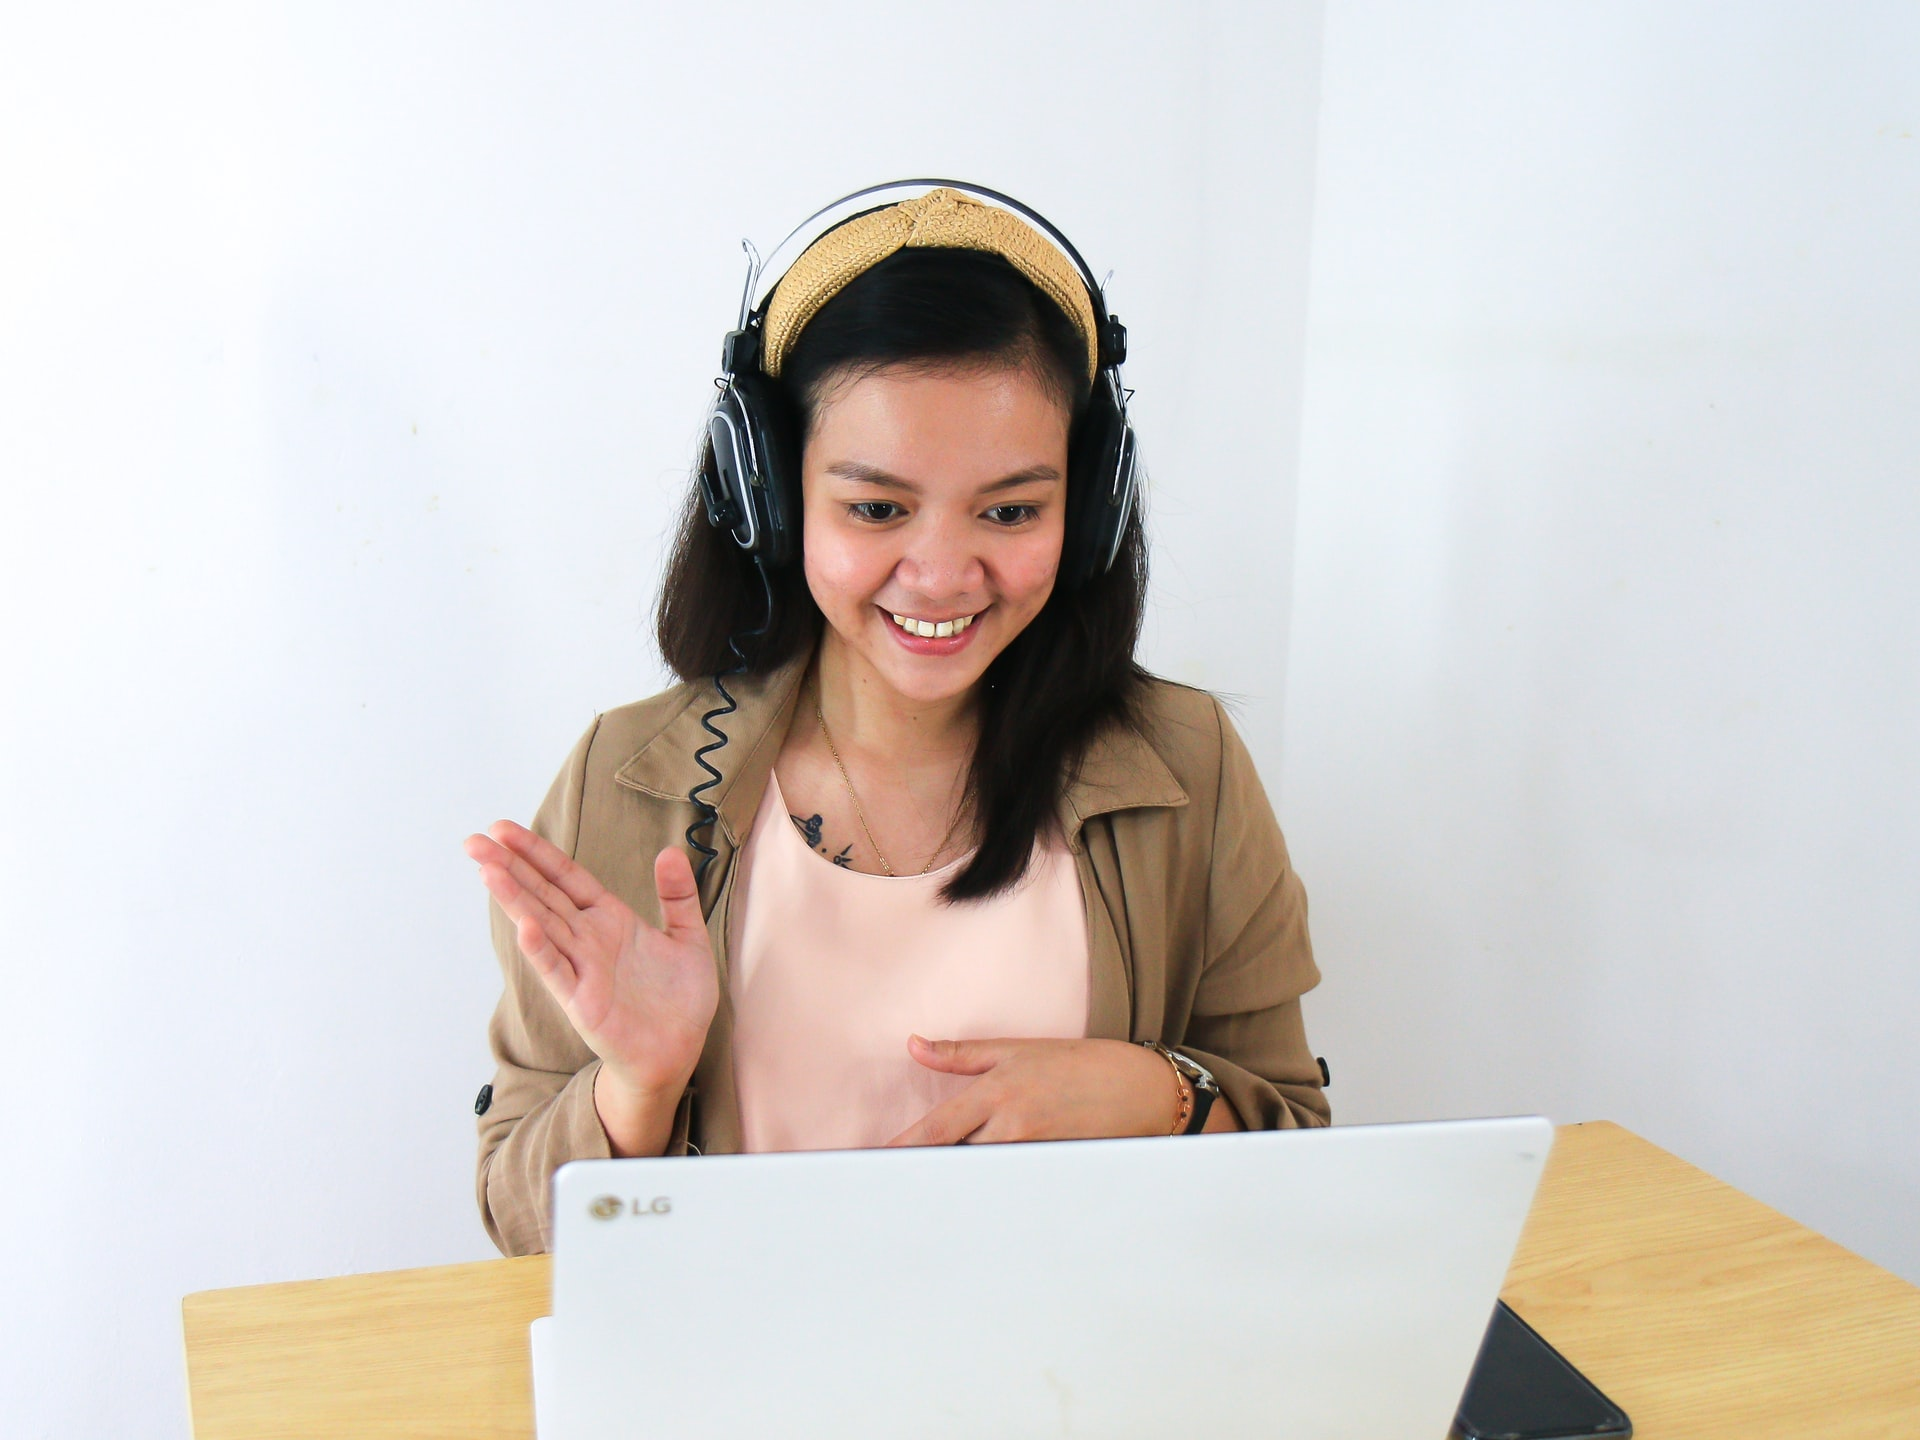 The modern interpreters story